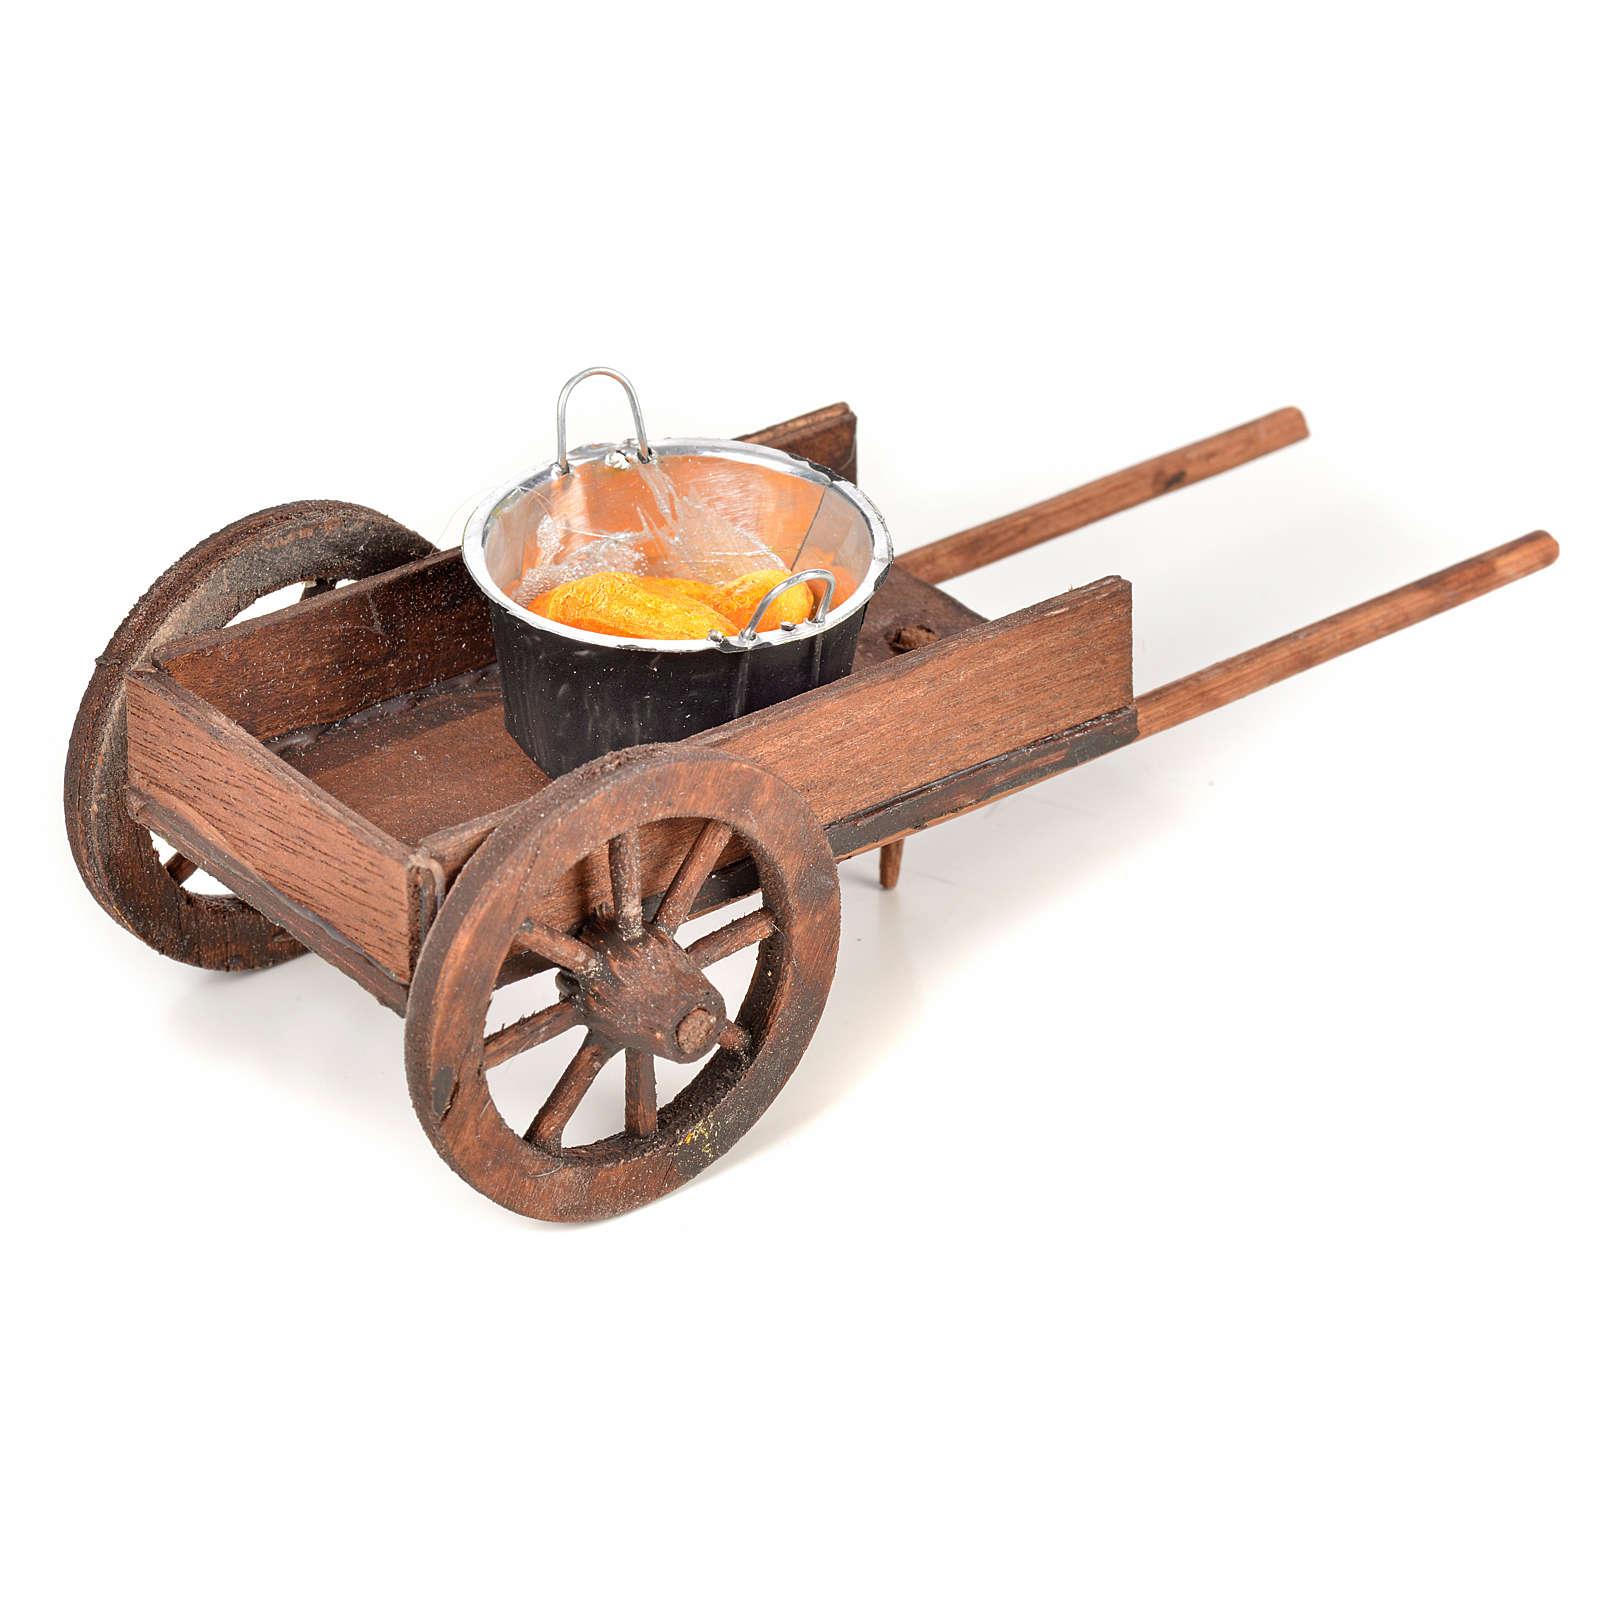 Neapolitan Nativity scene accessory, cart with pots and corn 4